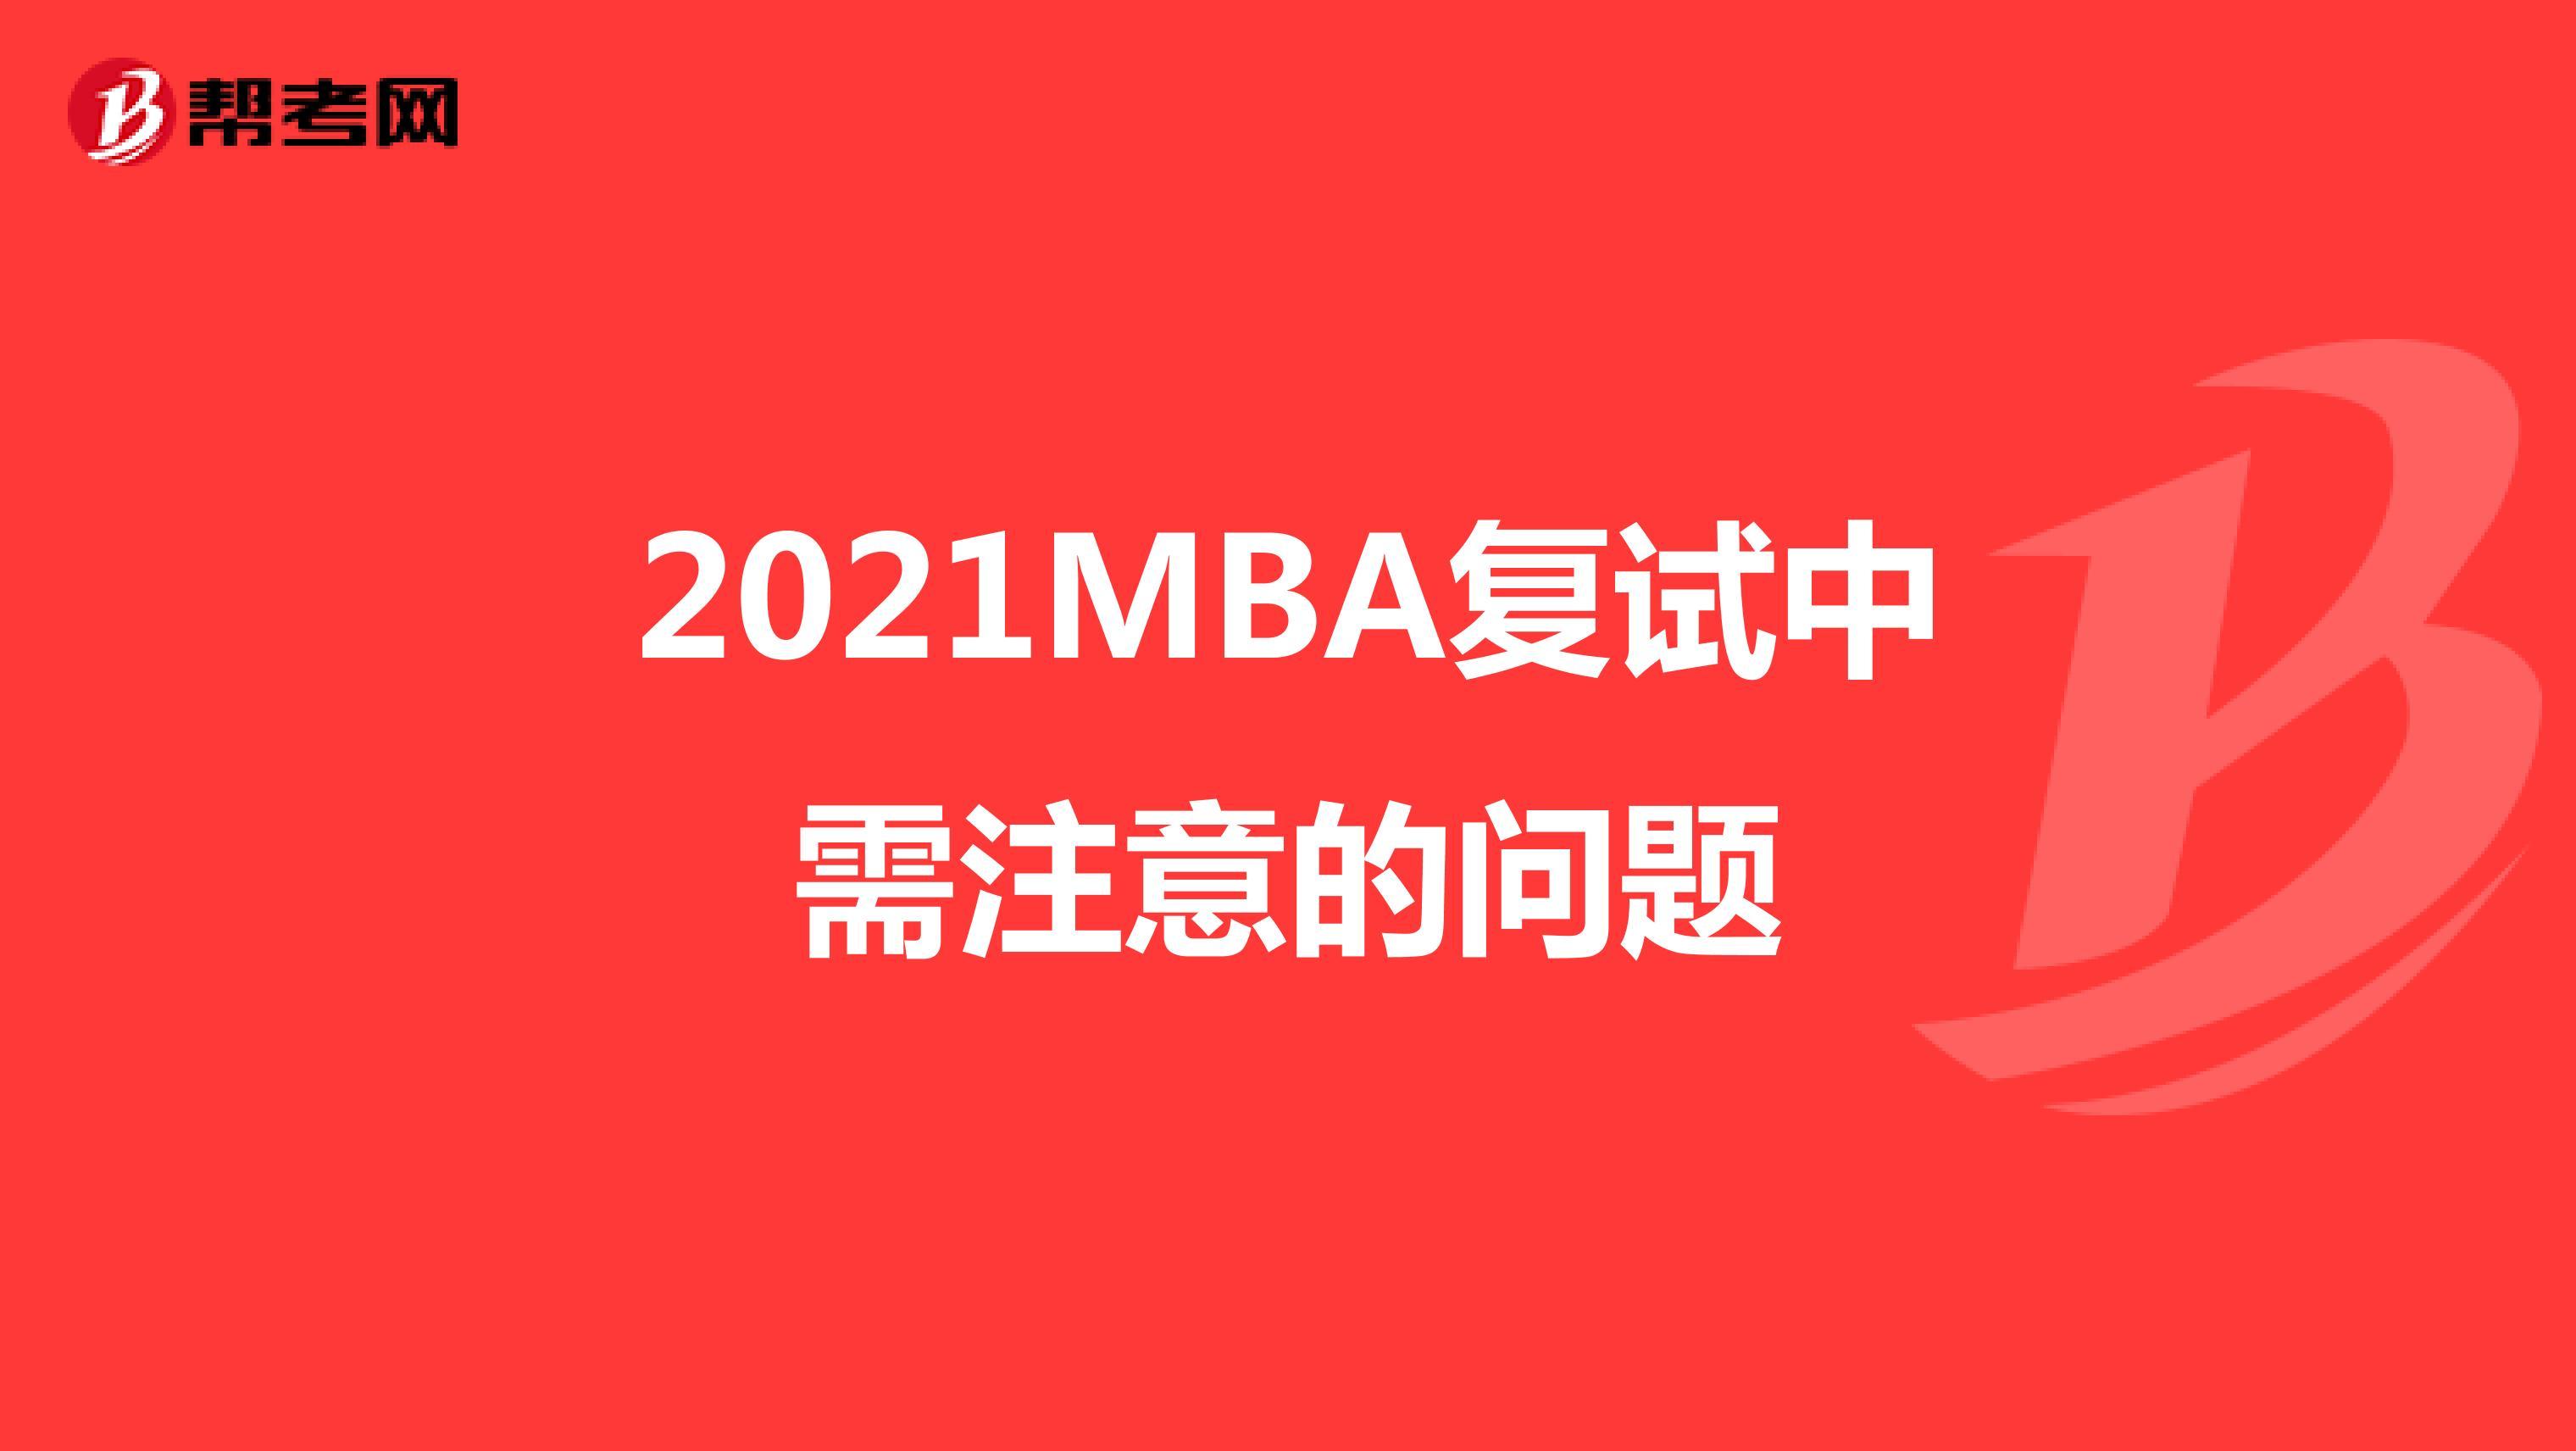 2021MBA复试中需注意的问题